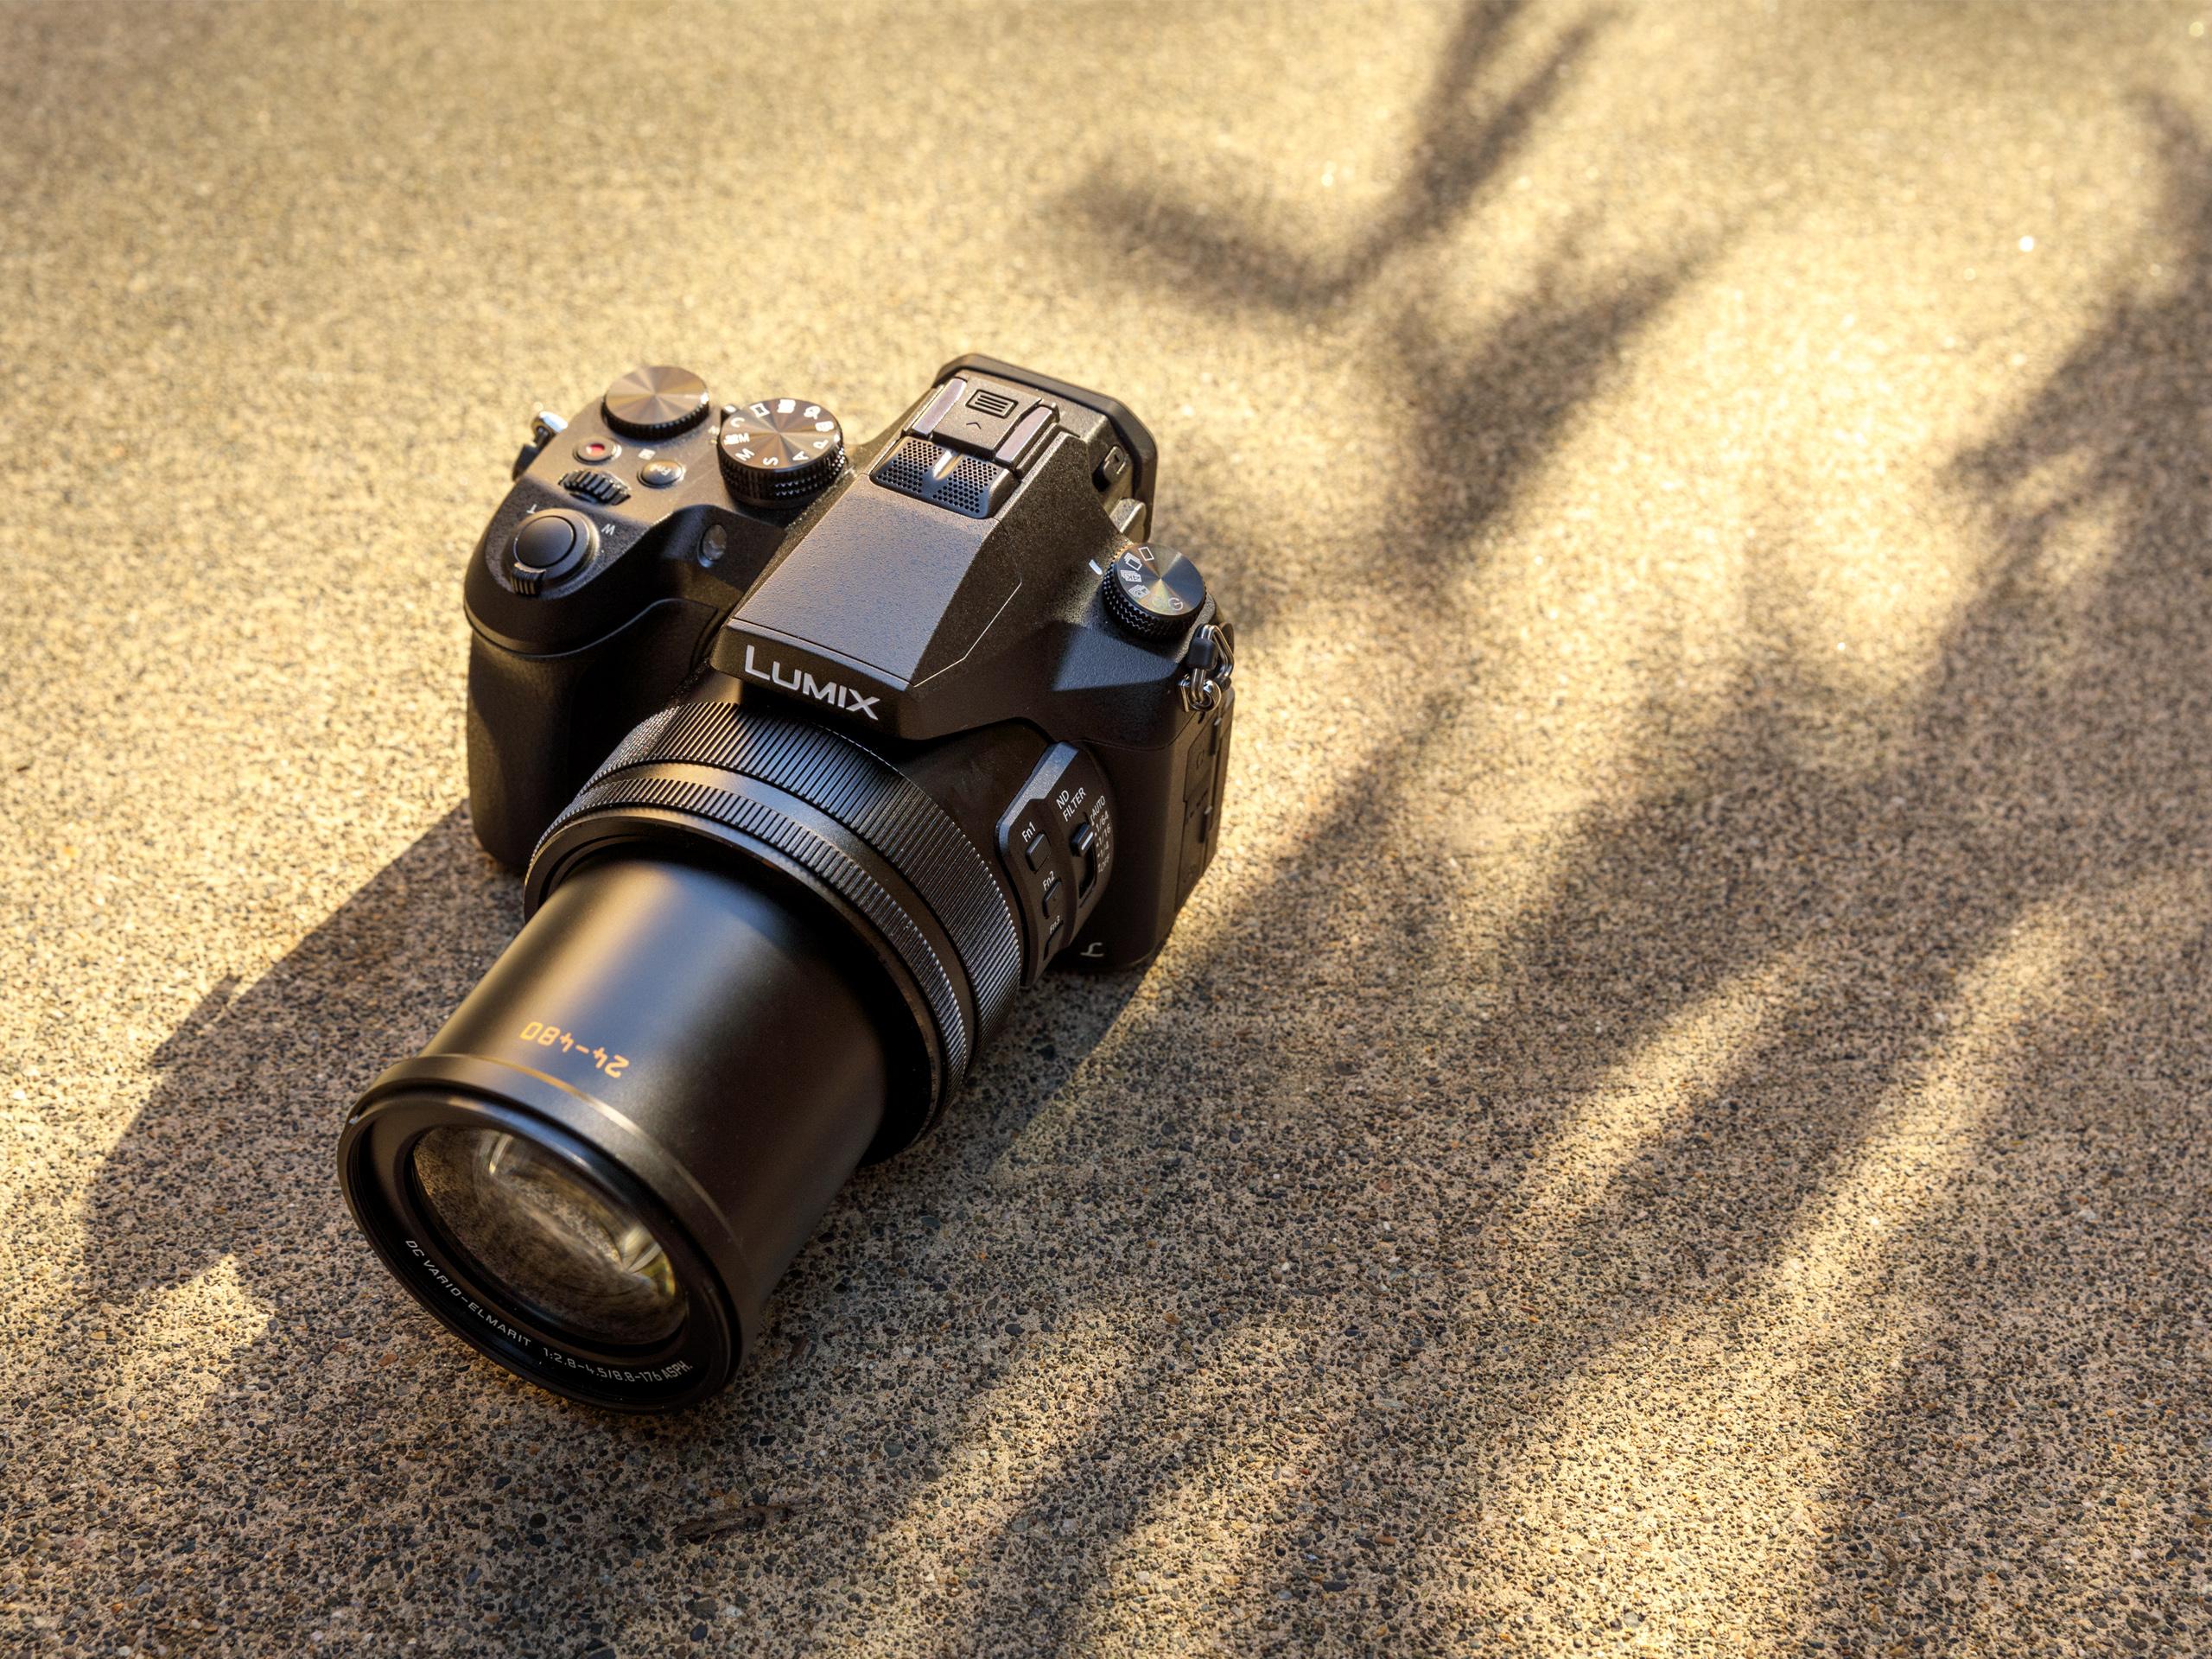 Fixed-lens filmmaking: Panasonic Lumix DMC-FZ2500/FZ2000 Review